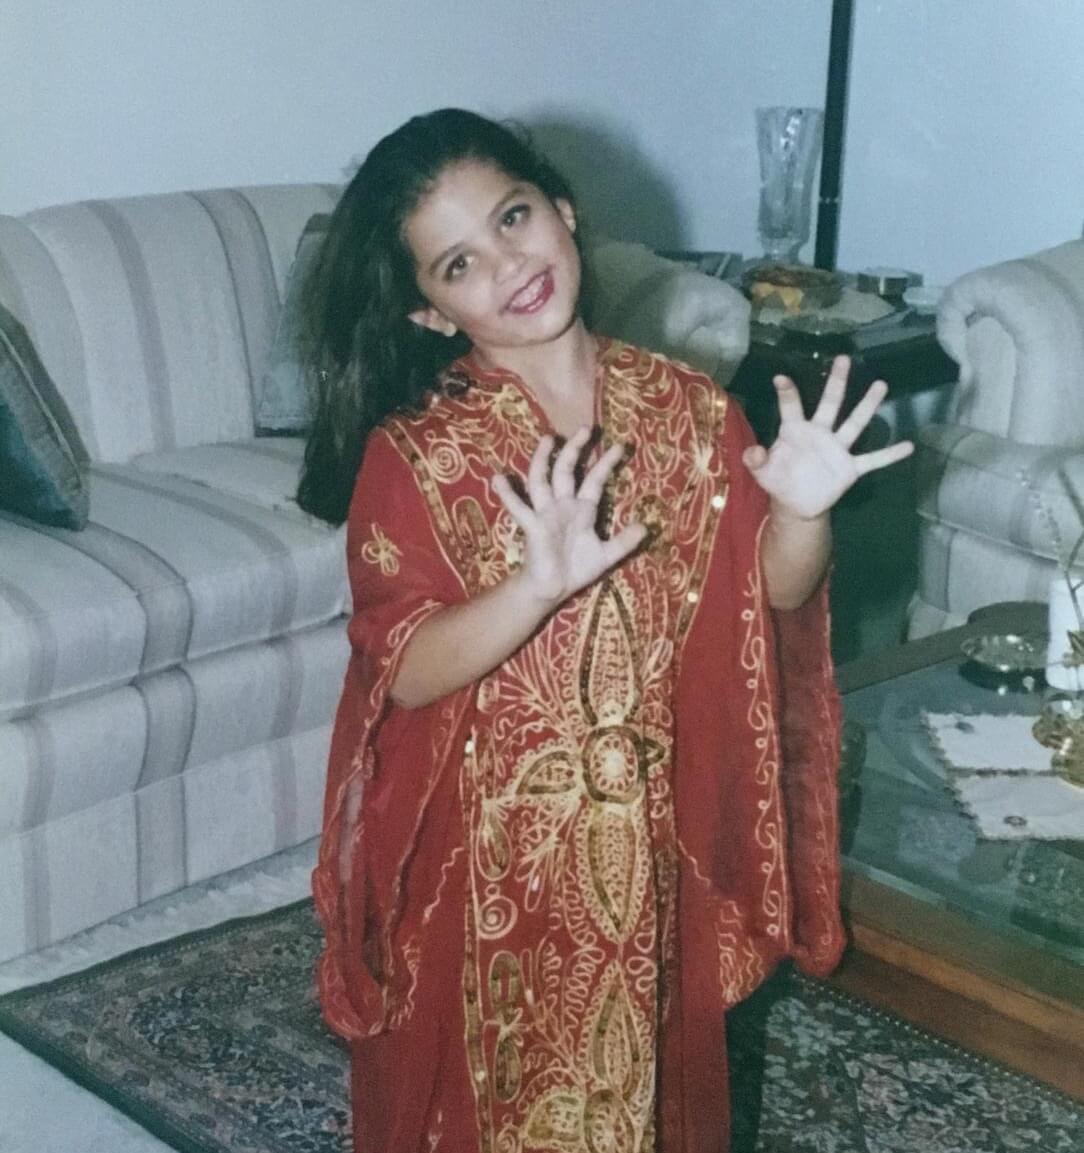 Ruba Halaoui